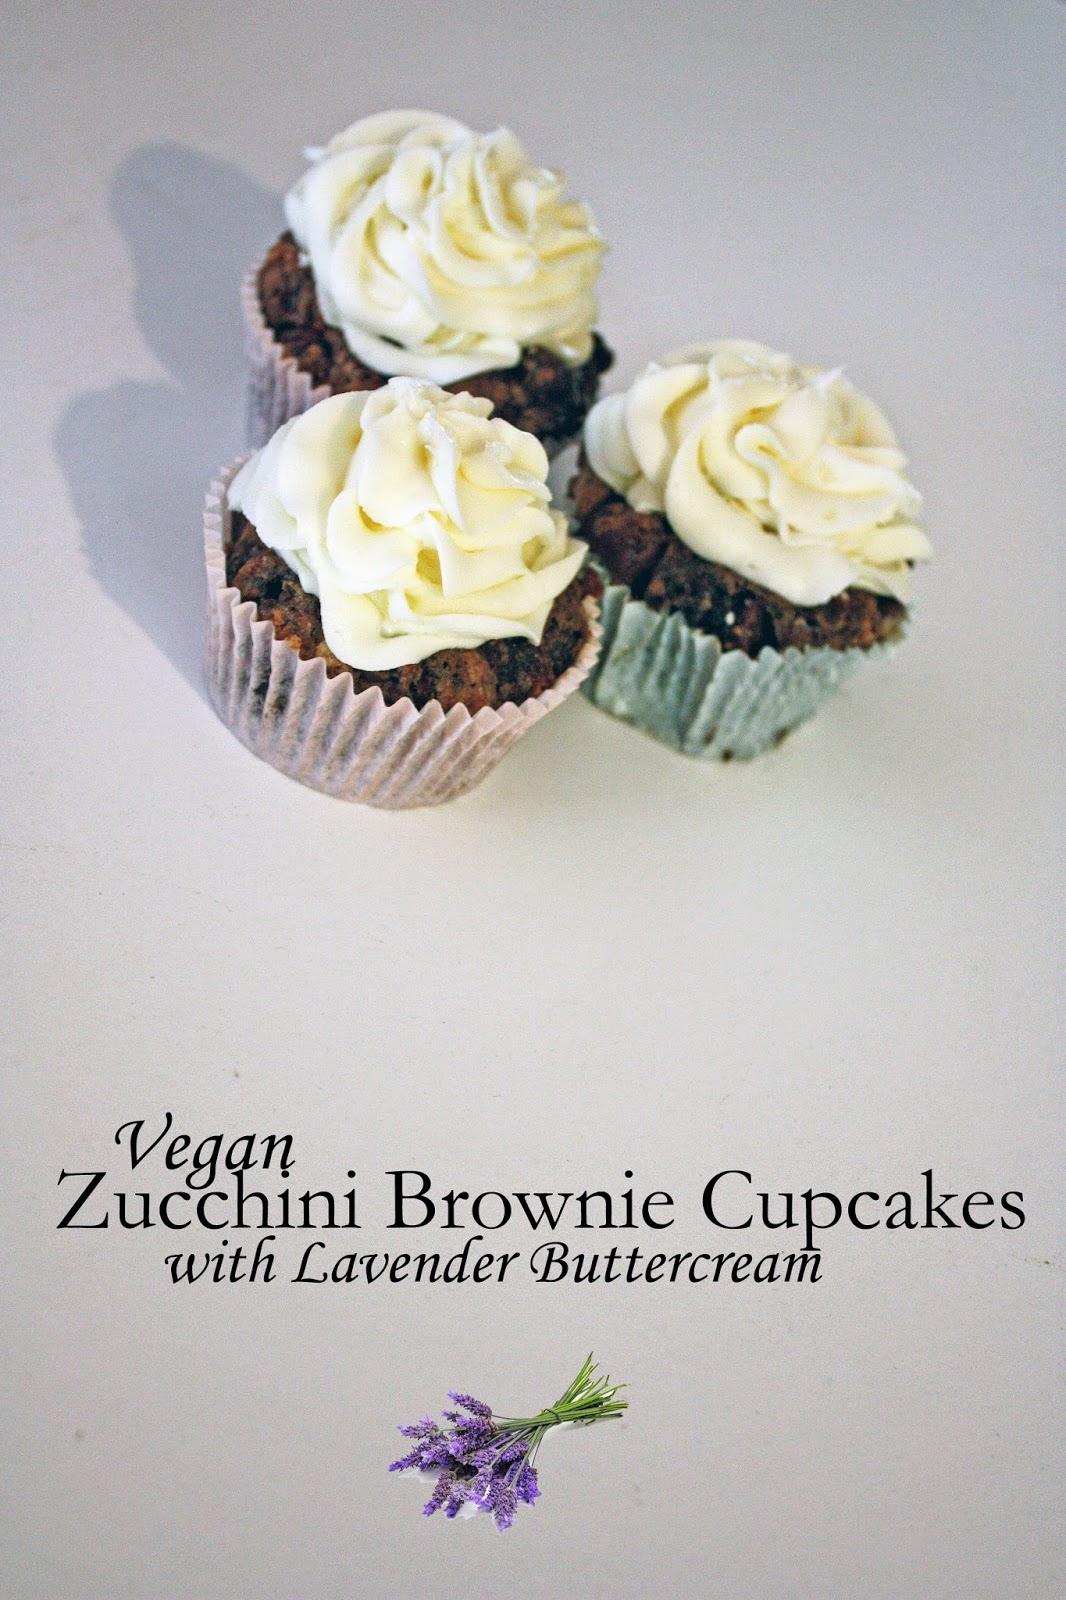 vegan chocolate zucchini lavender buttercream brownie cupcakes